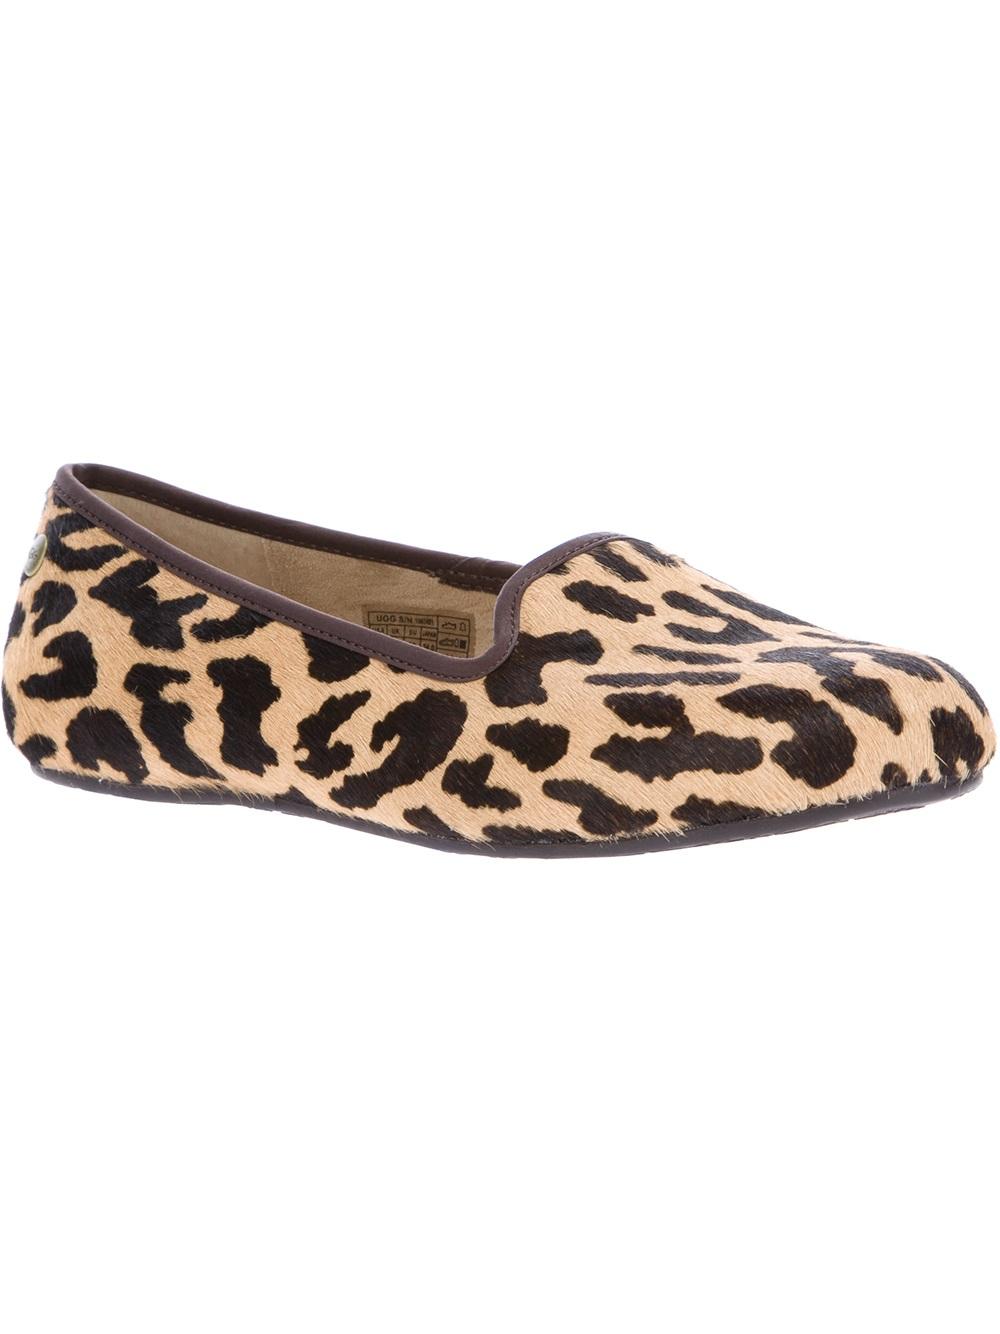 ugg animal print slippers